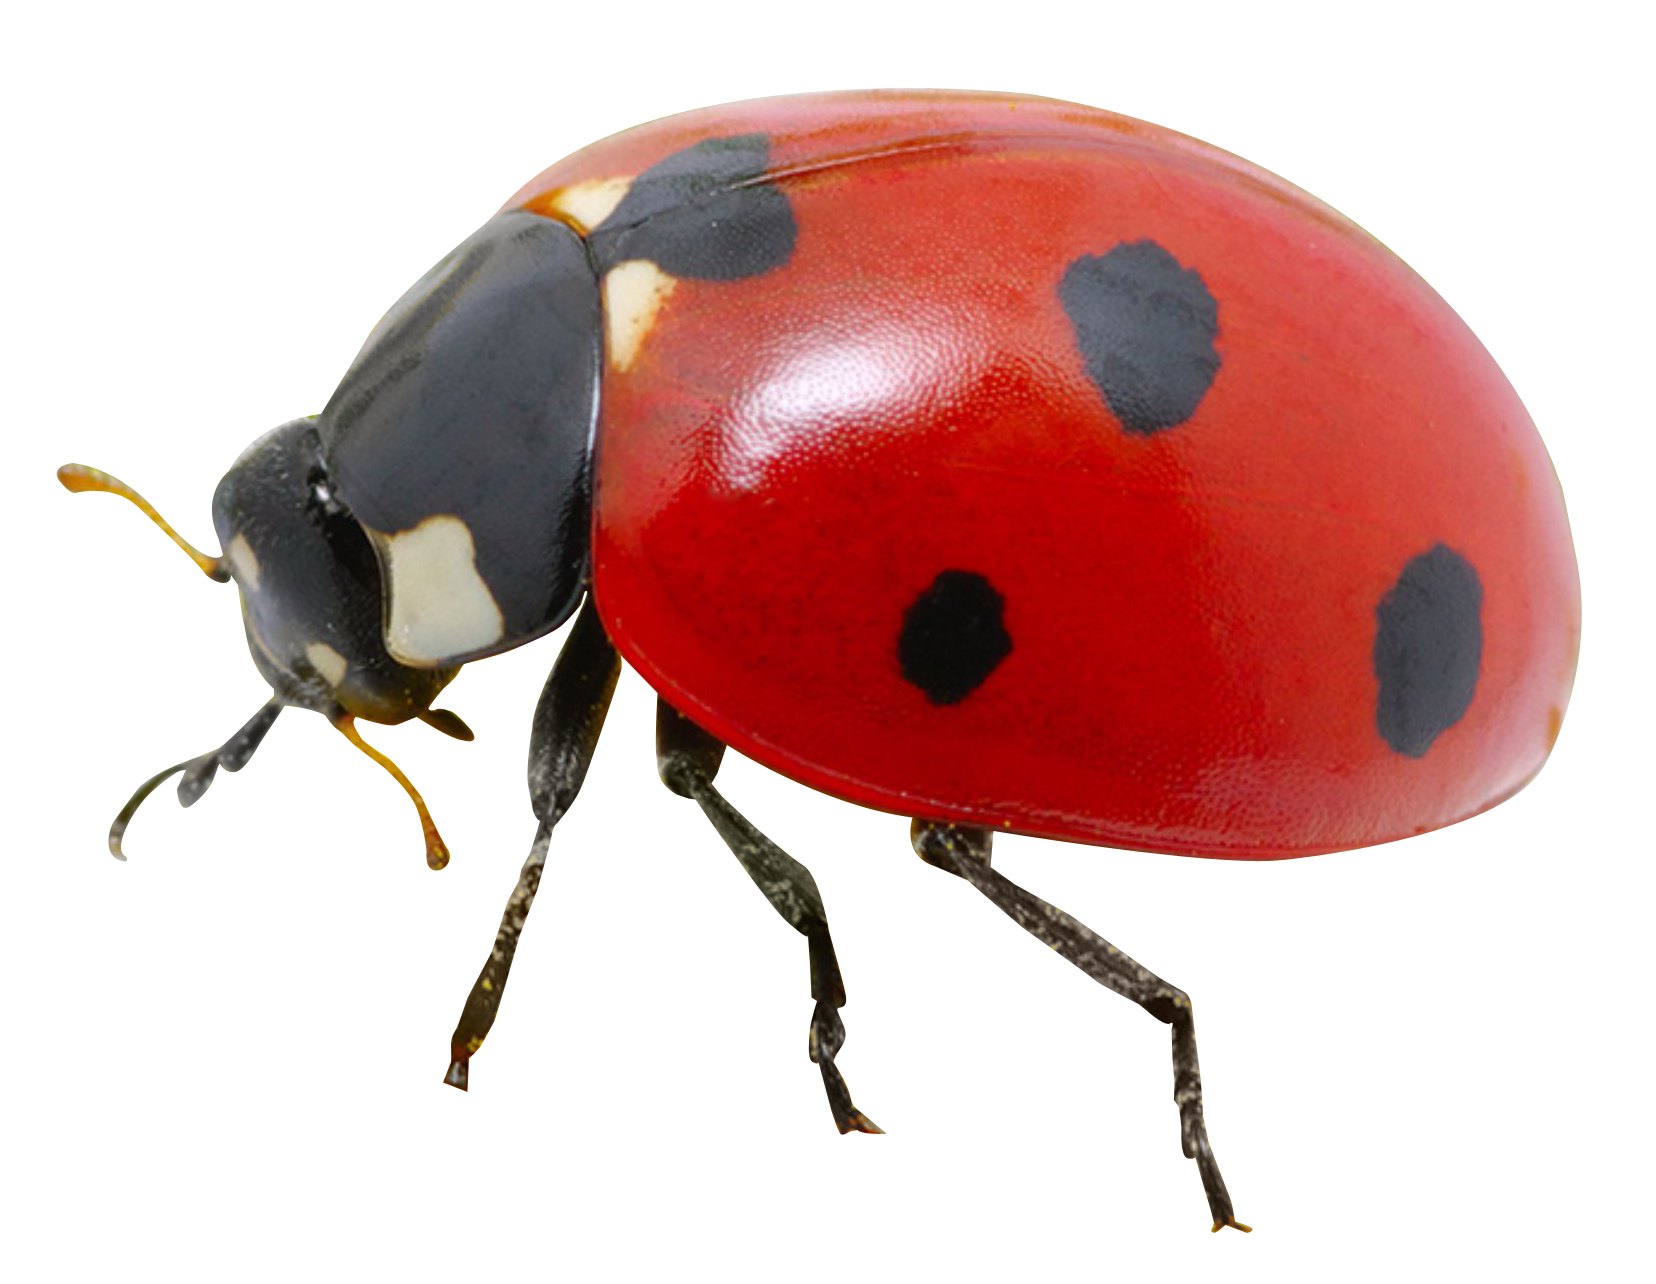 Ladybug PNG Transparent Image - Ladybug PNG